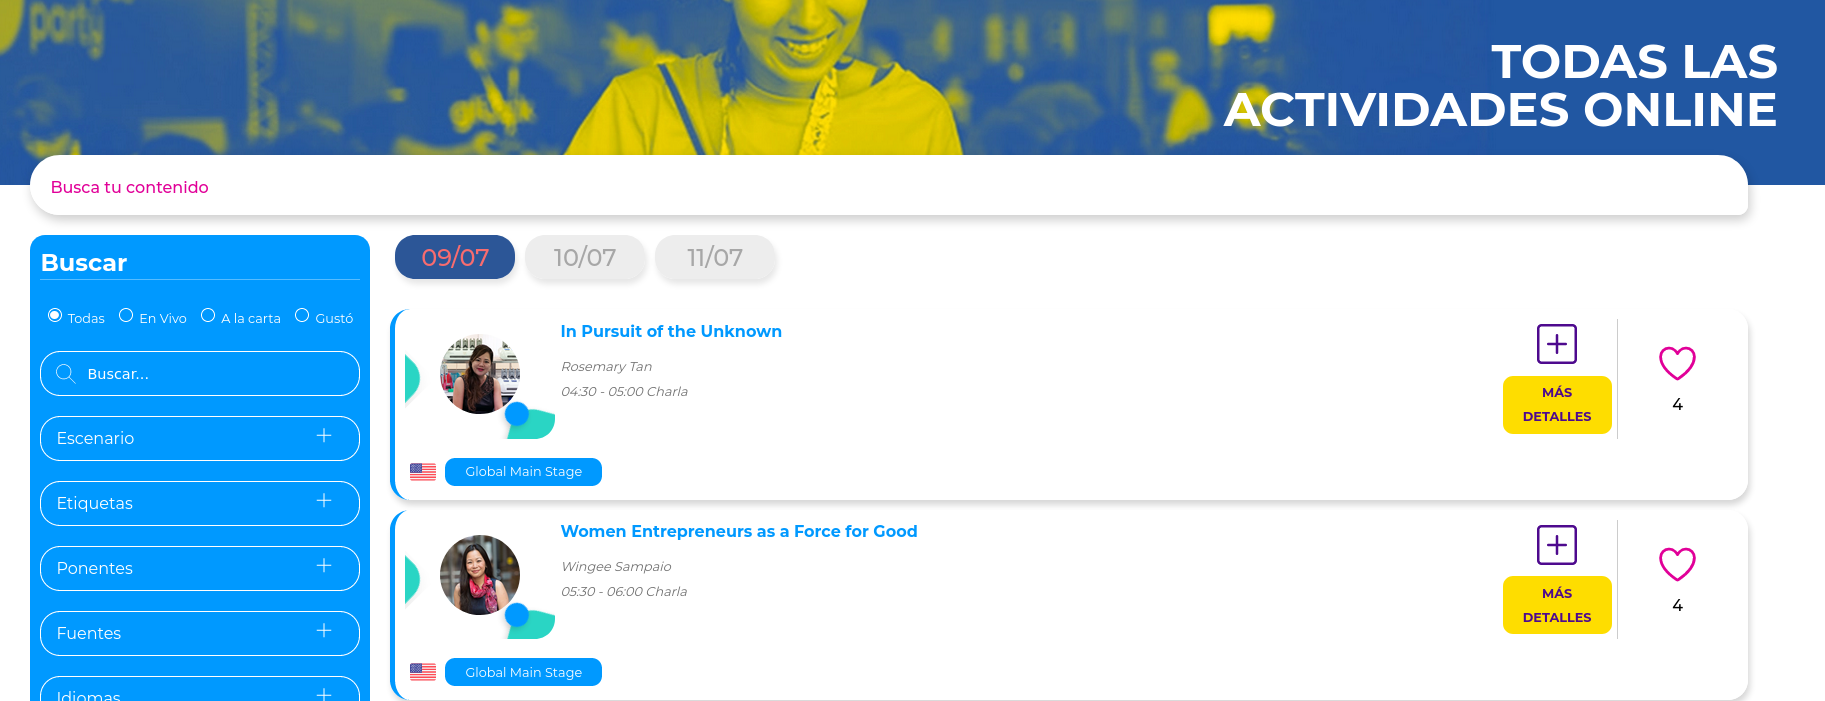 Campus Party Agenda 2020